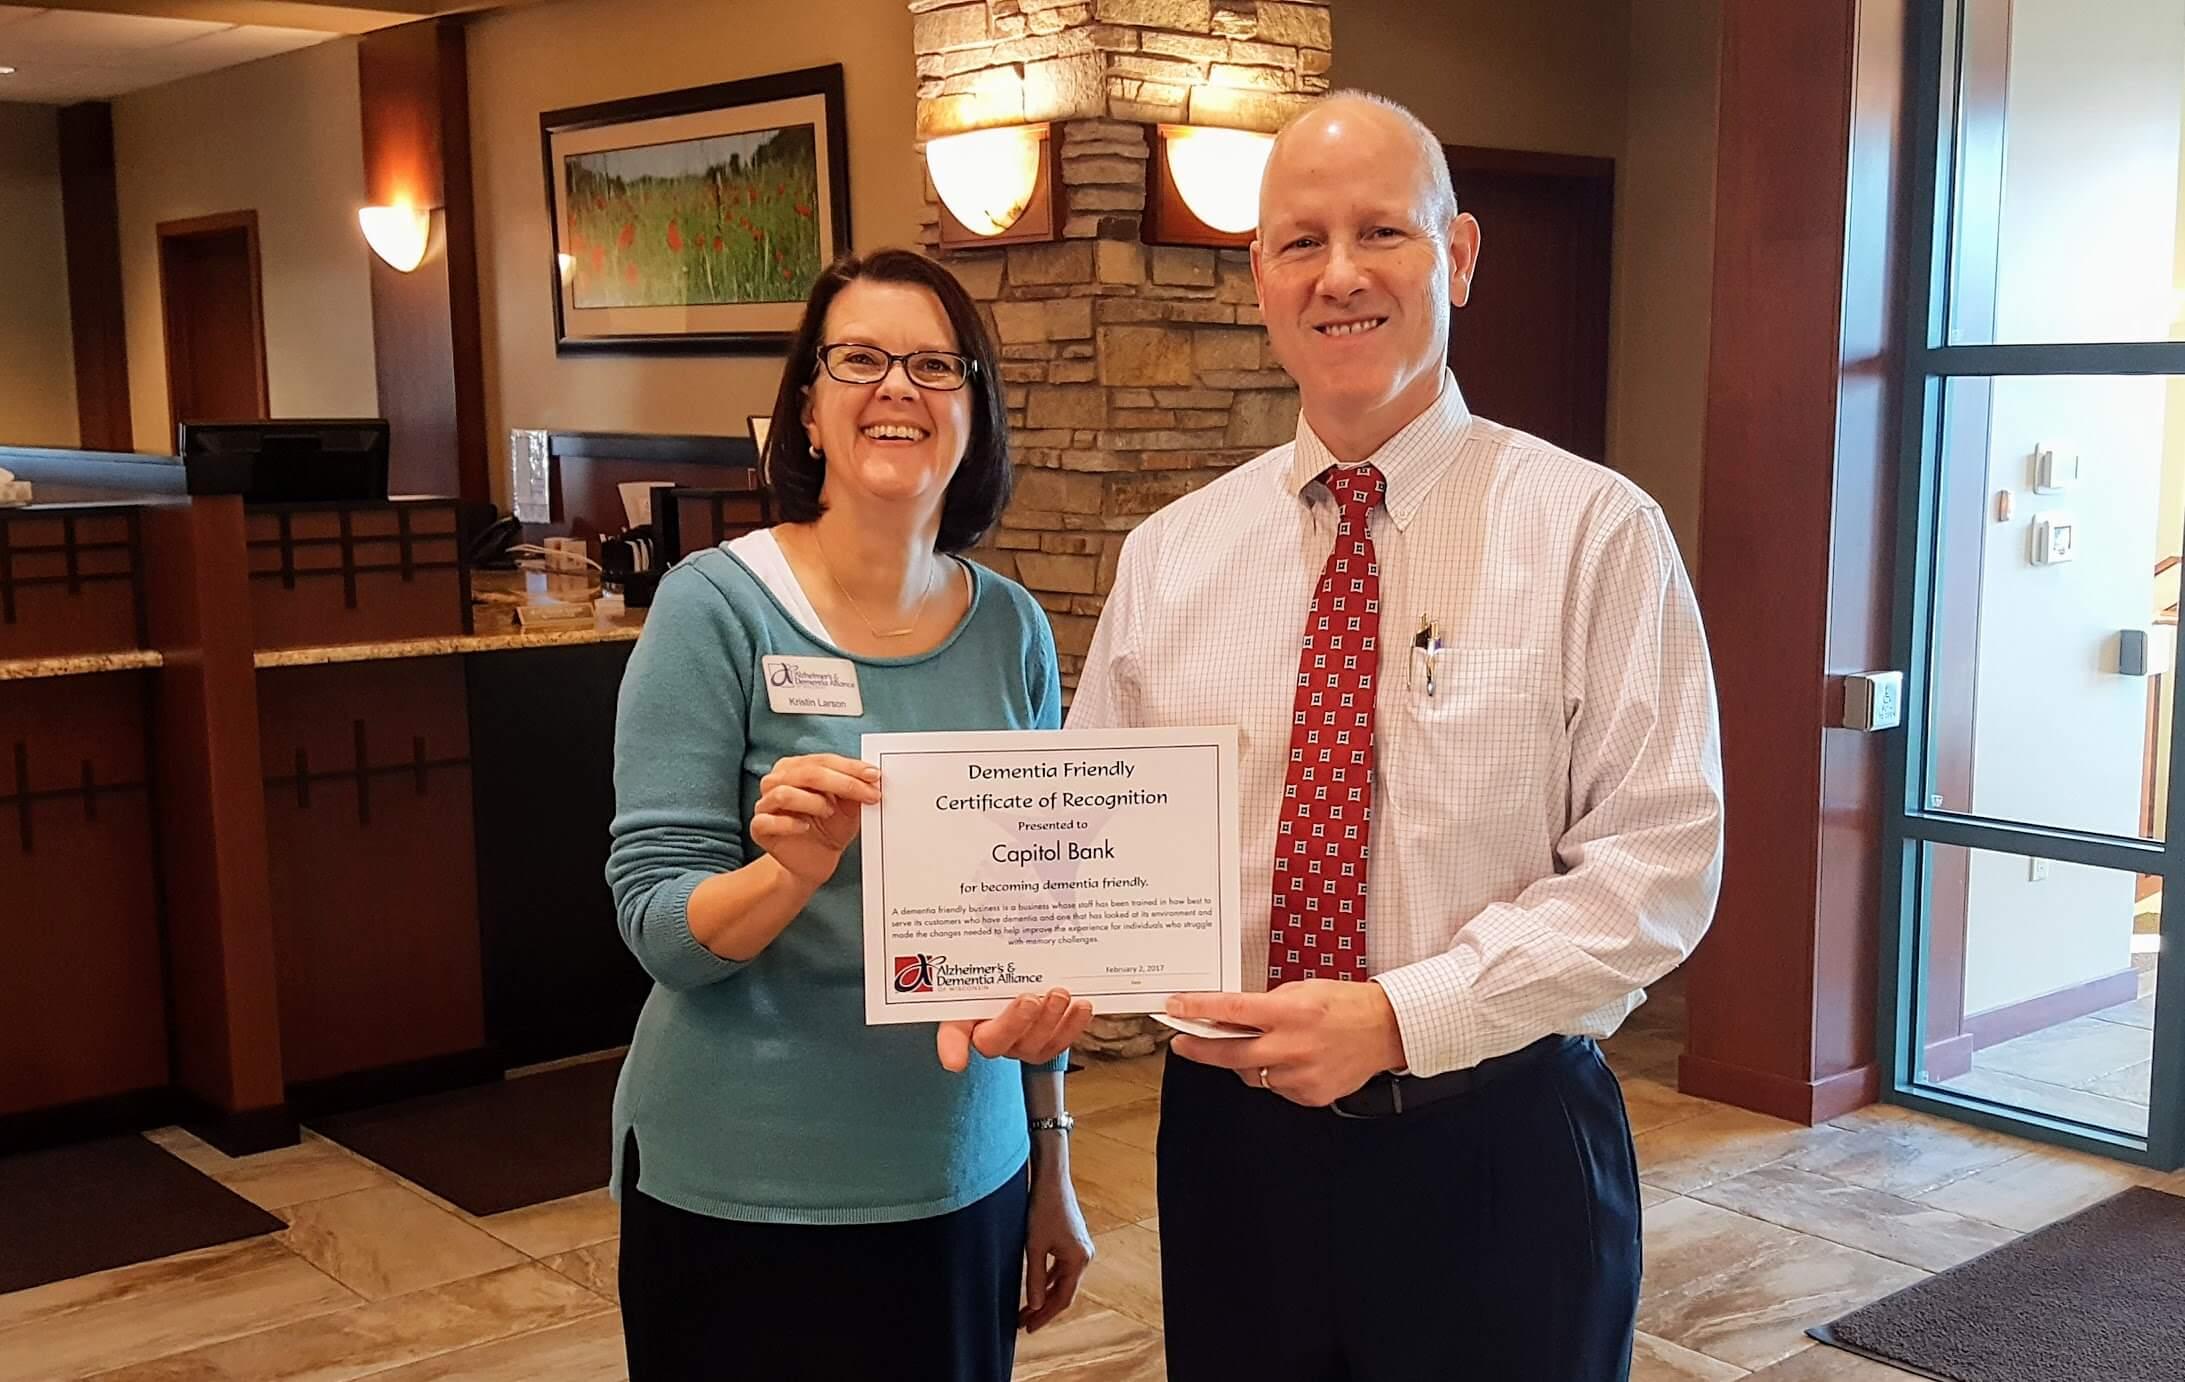 Ken Thompson receives dementia certification from Kristin Larson